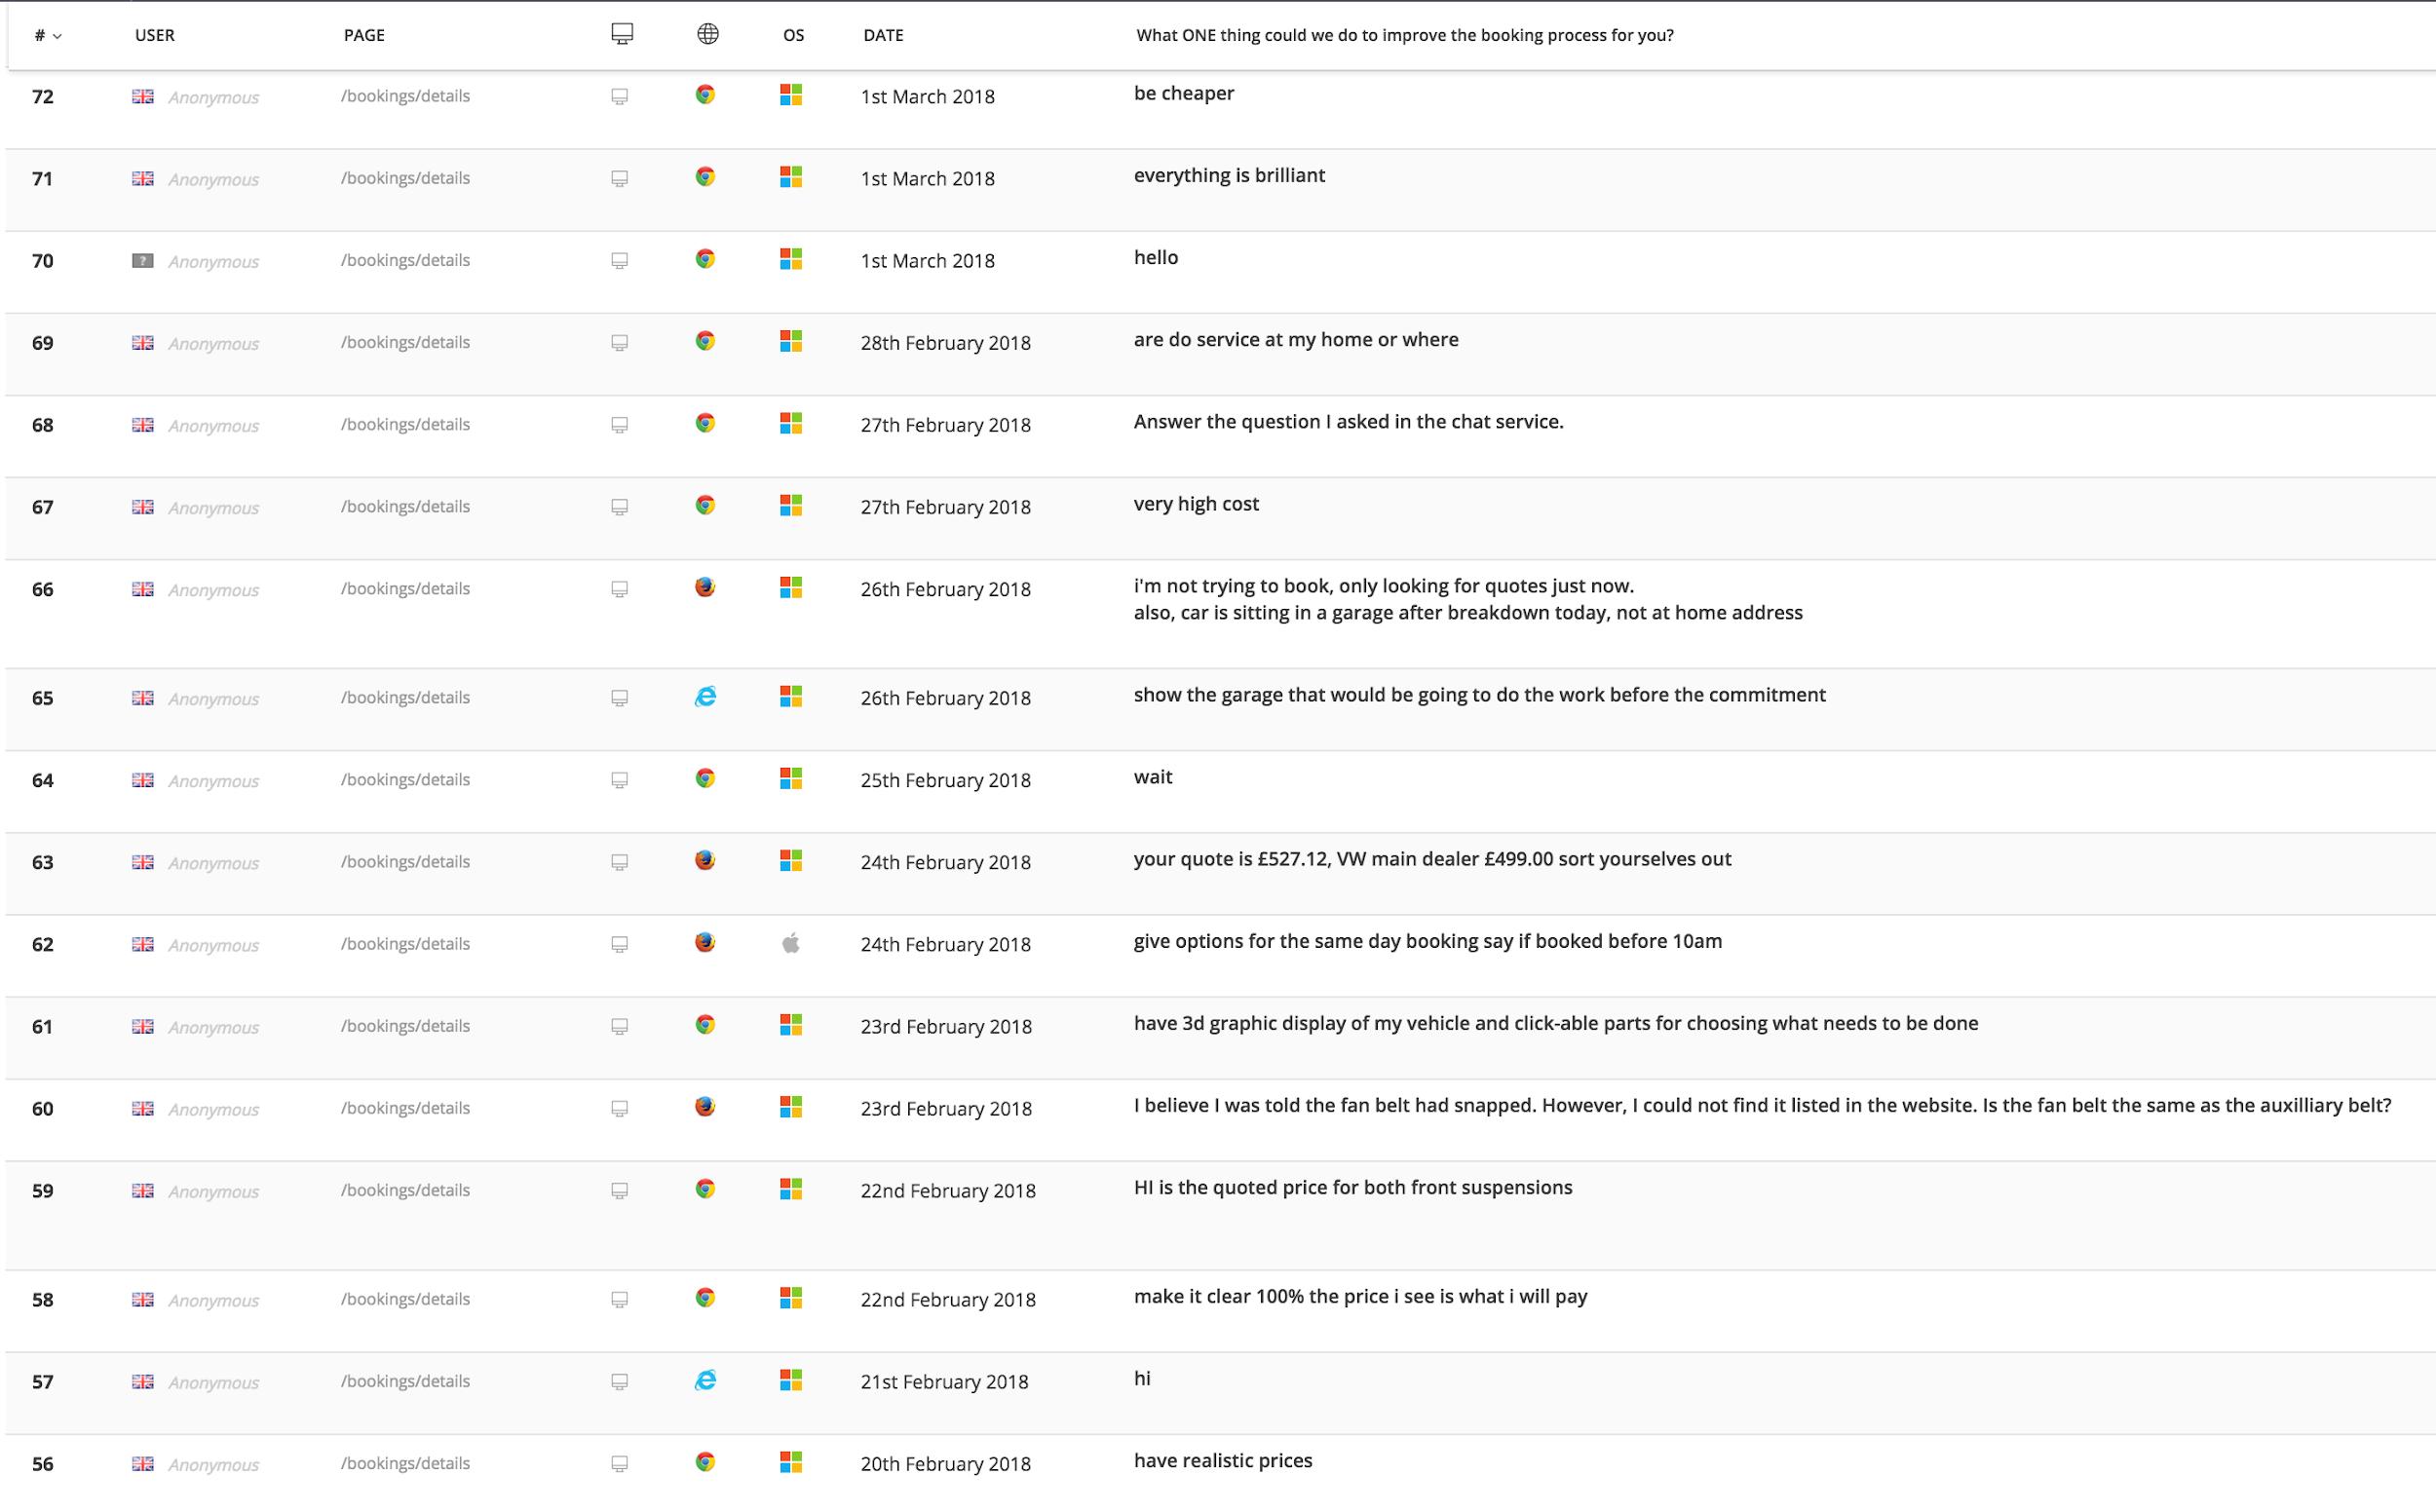 clickmechanic-hotjar-survey-results